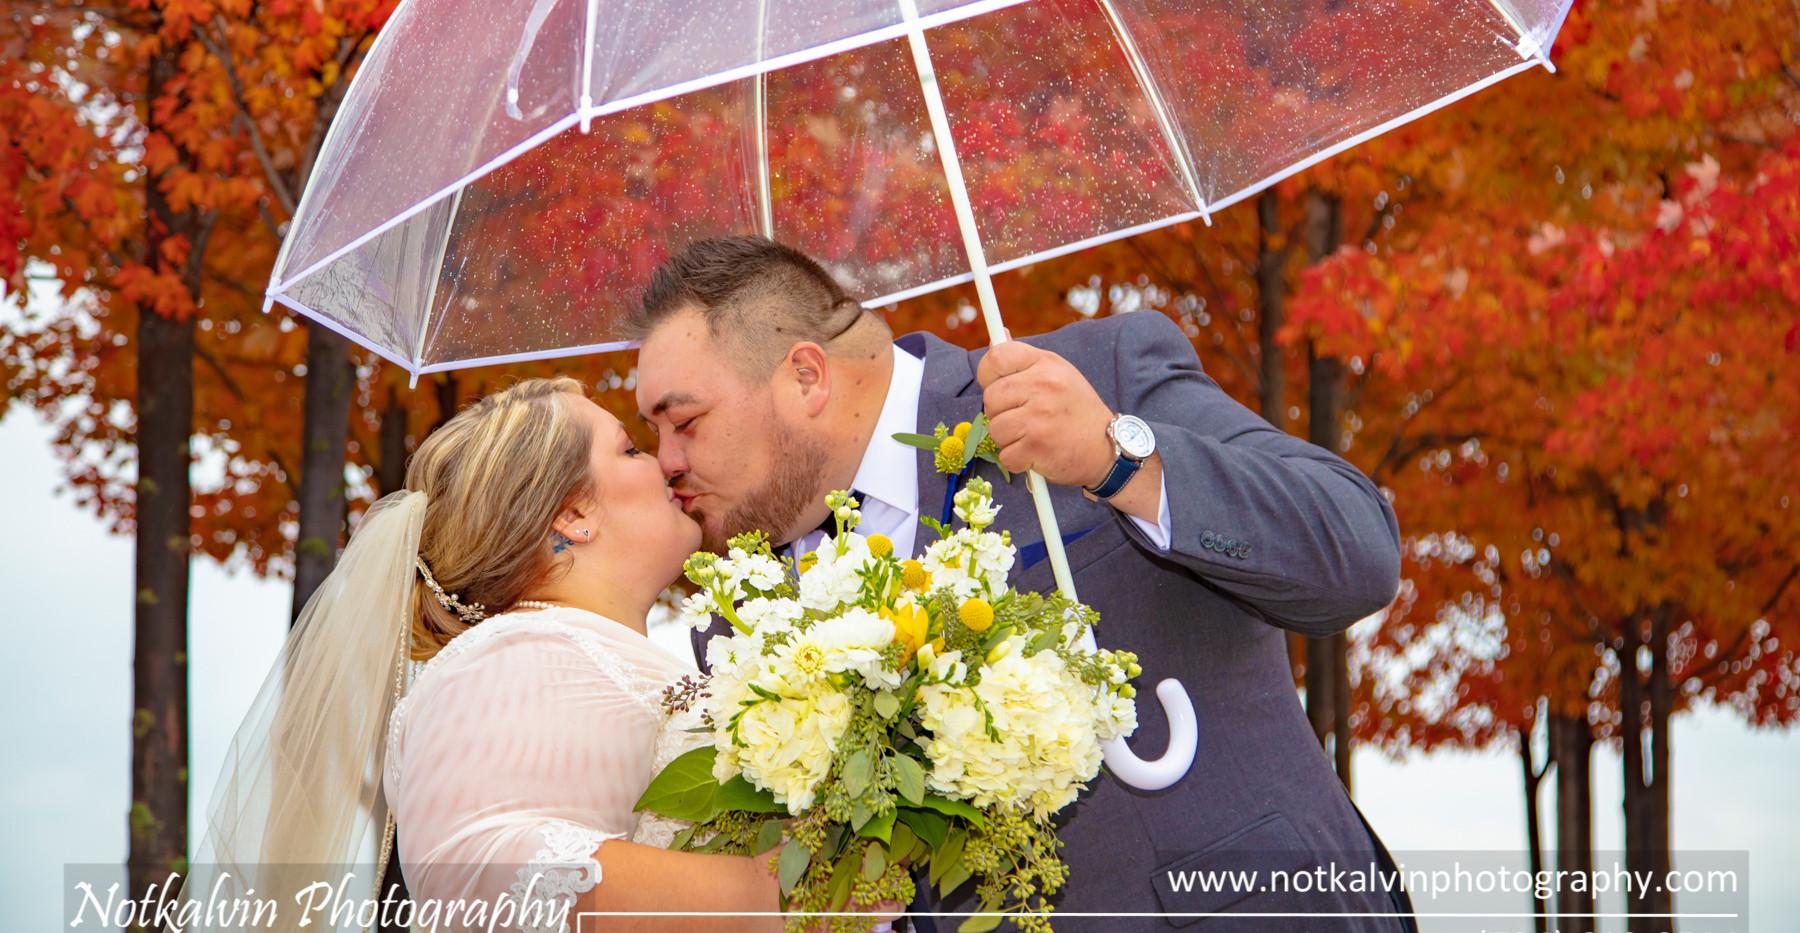 T+T Wedding - 1z3a5952_1.jpg